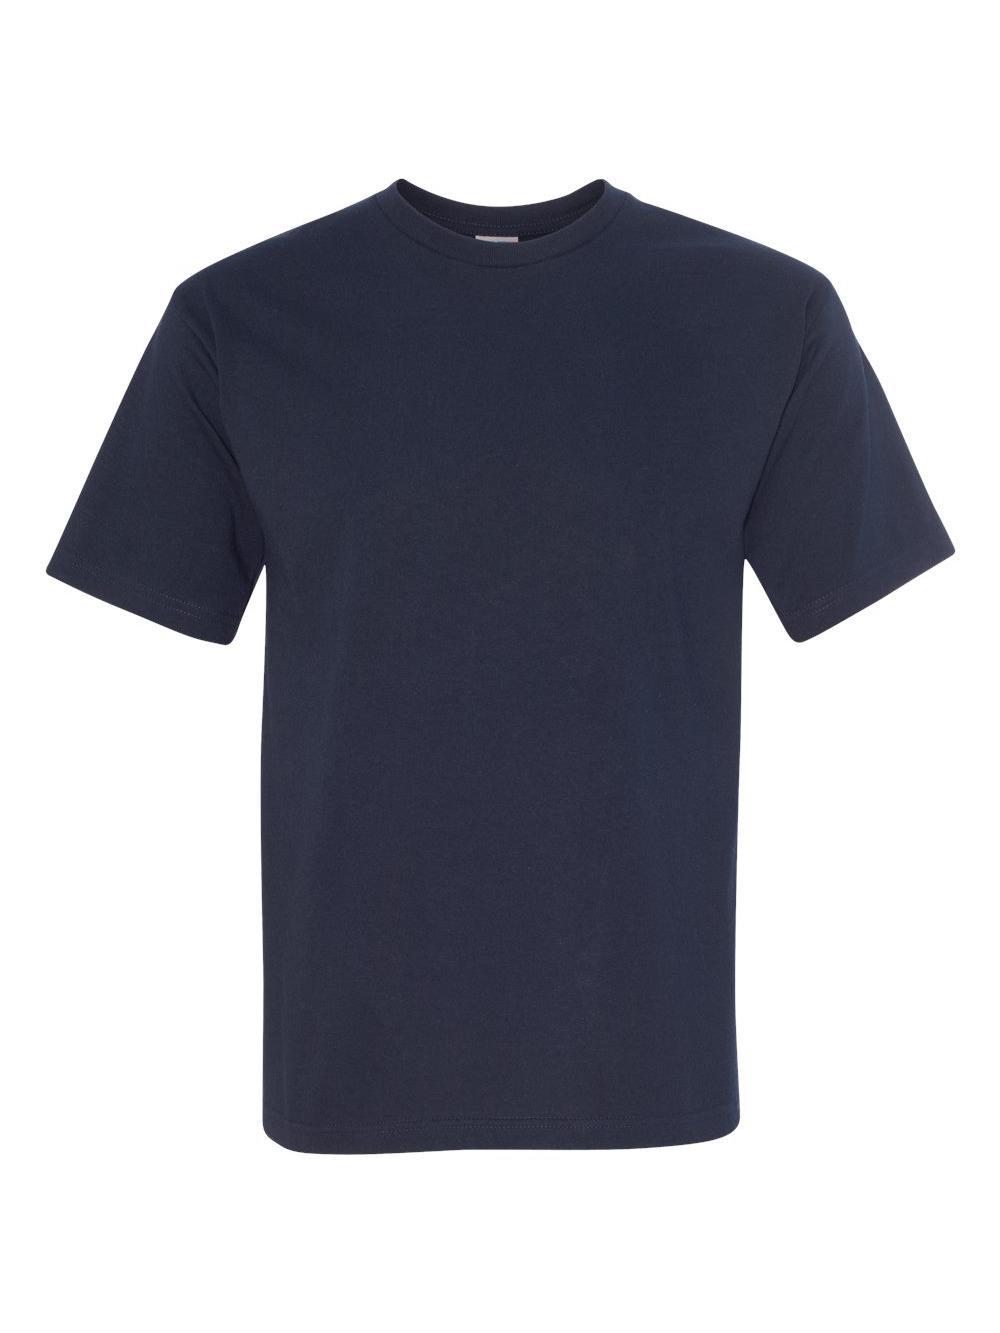 Bayside-USA-Made-100-Cotton-Short-Sleeve-T-Shirt-5040 thumbnail 15